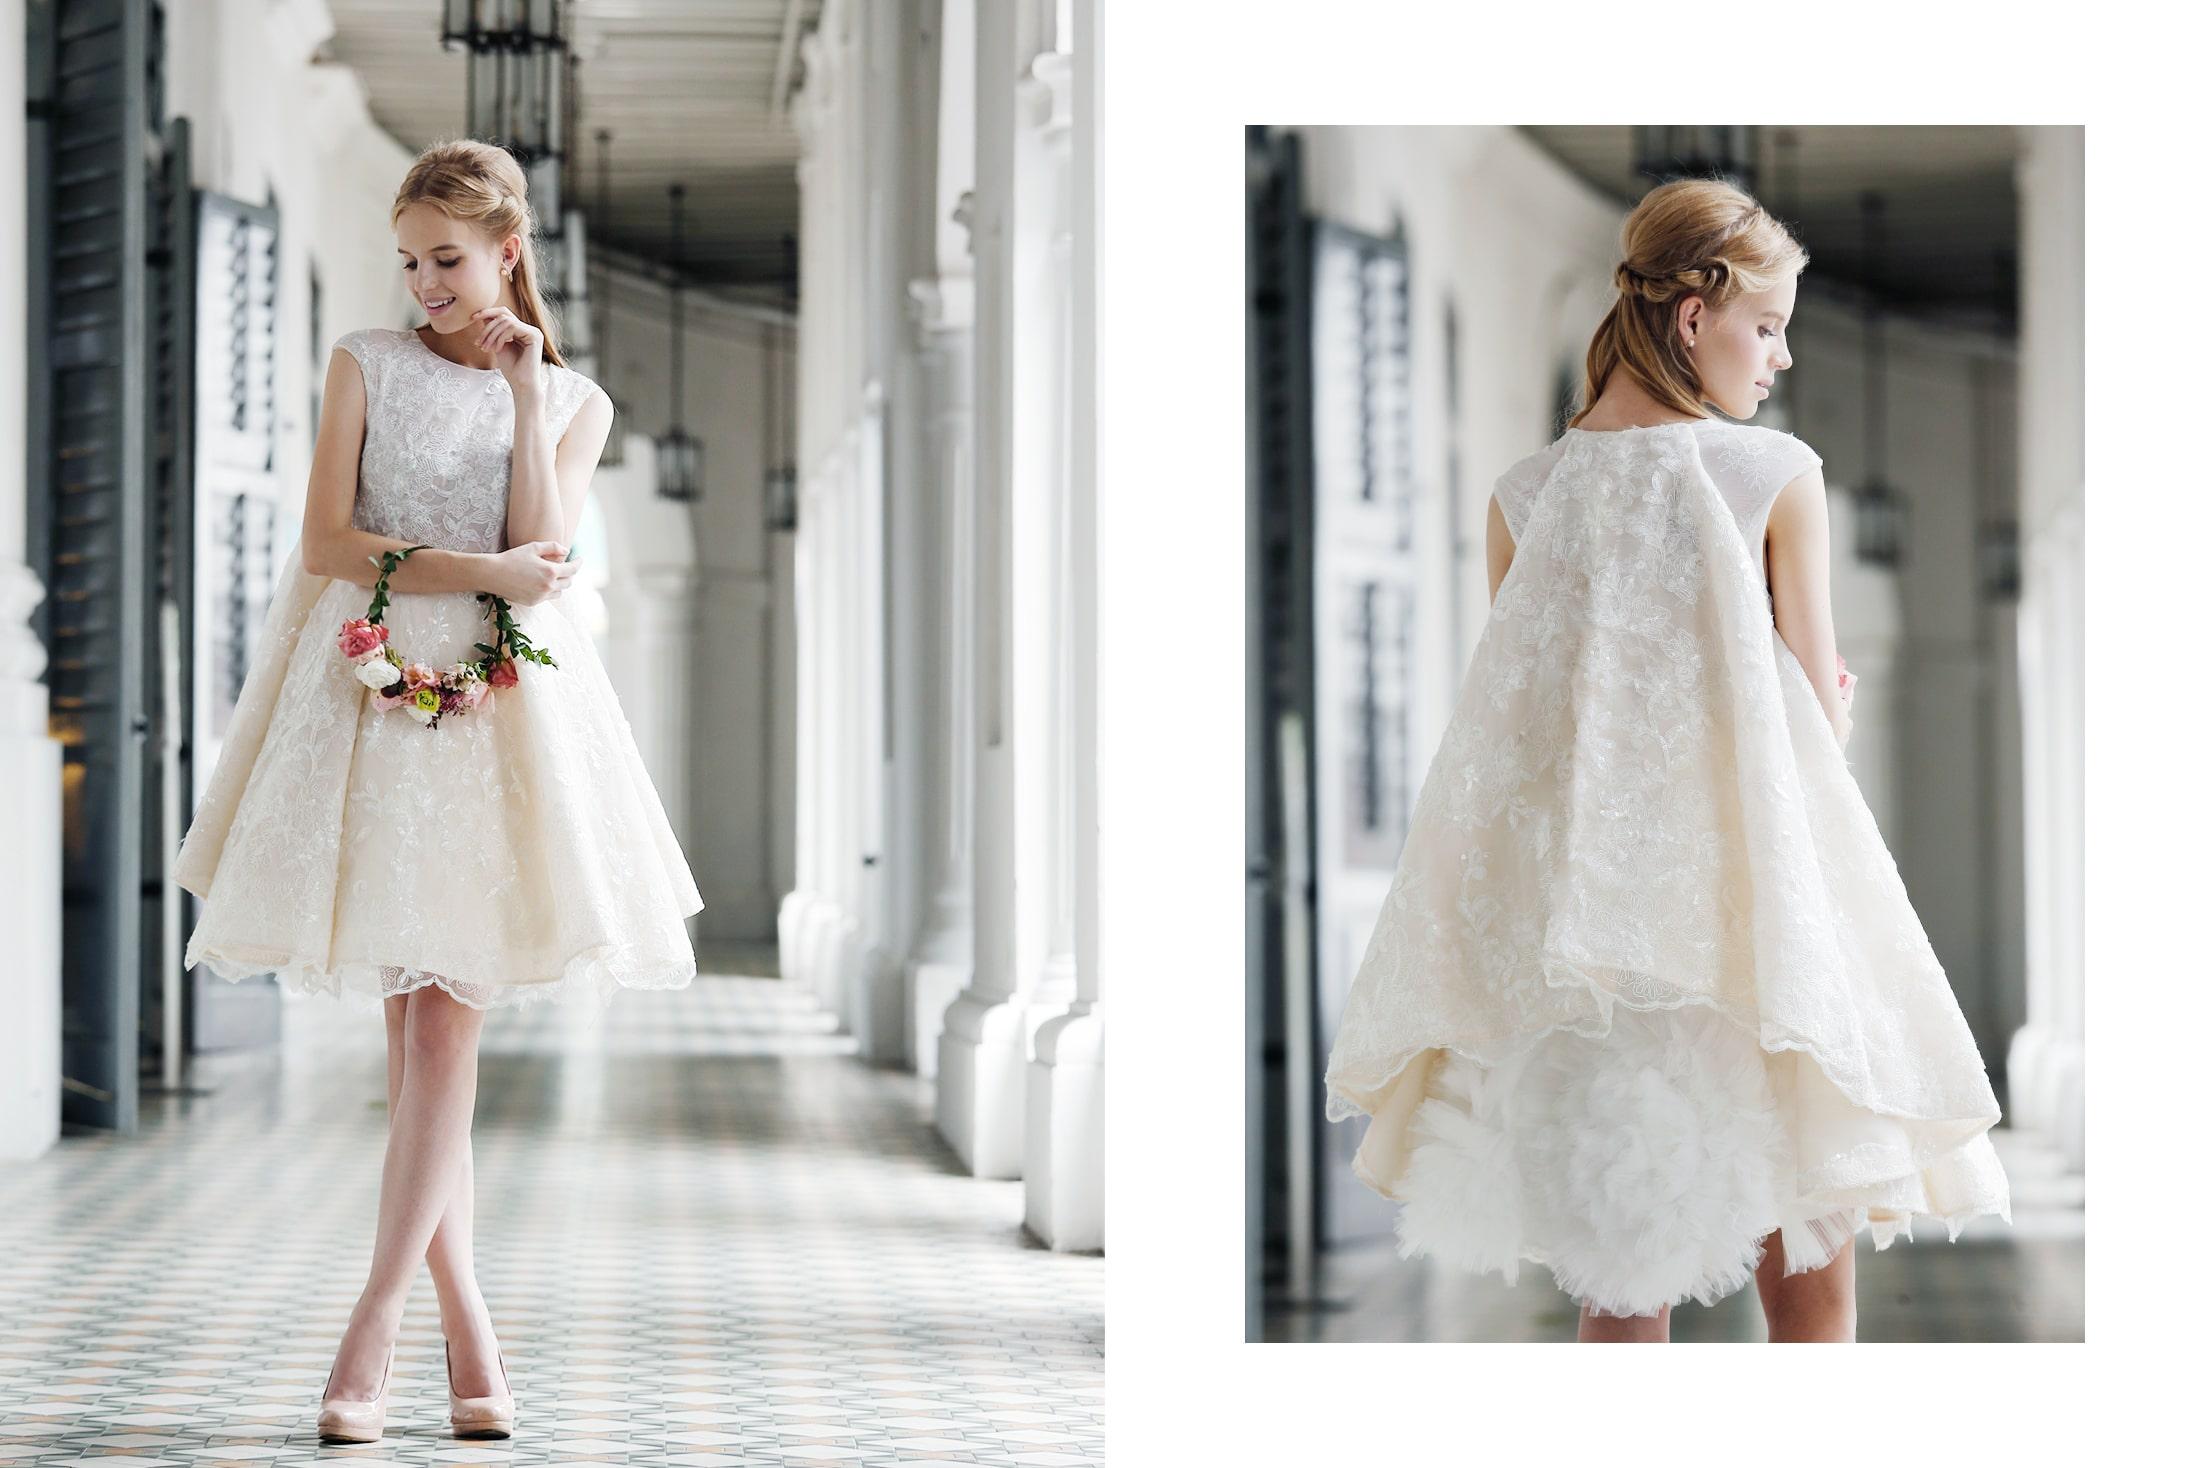 13-Z-Wedding-Lace-Engagement-A-line-Dress-with-Cape